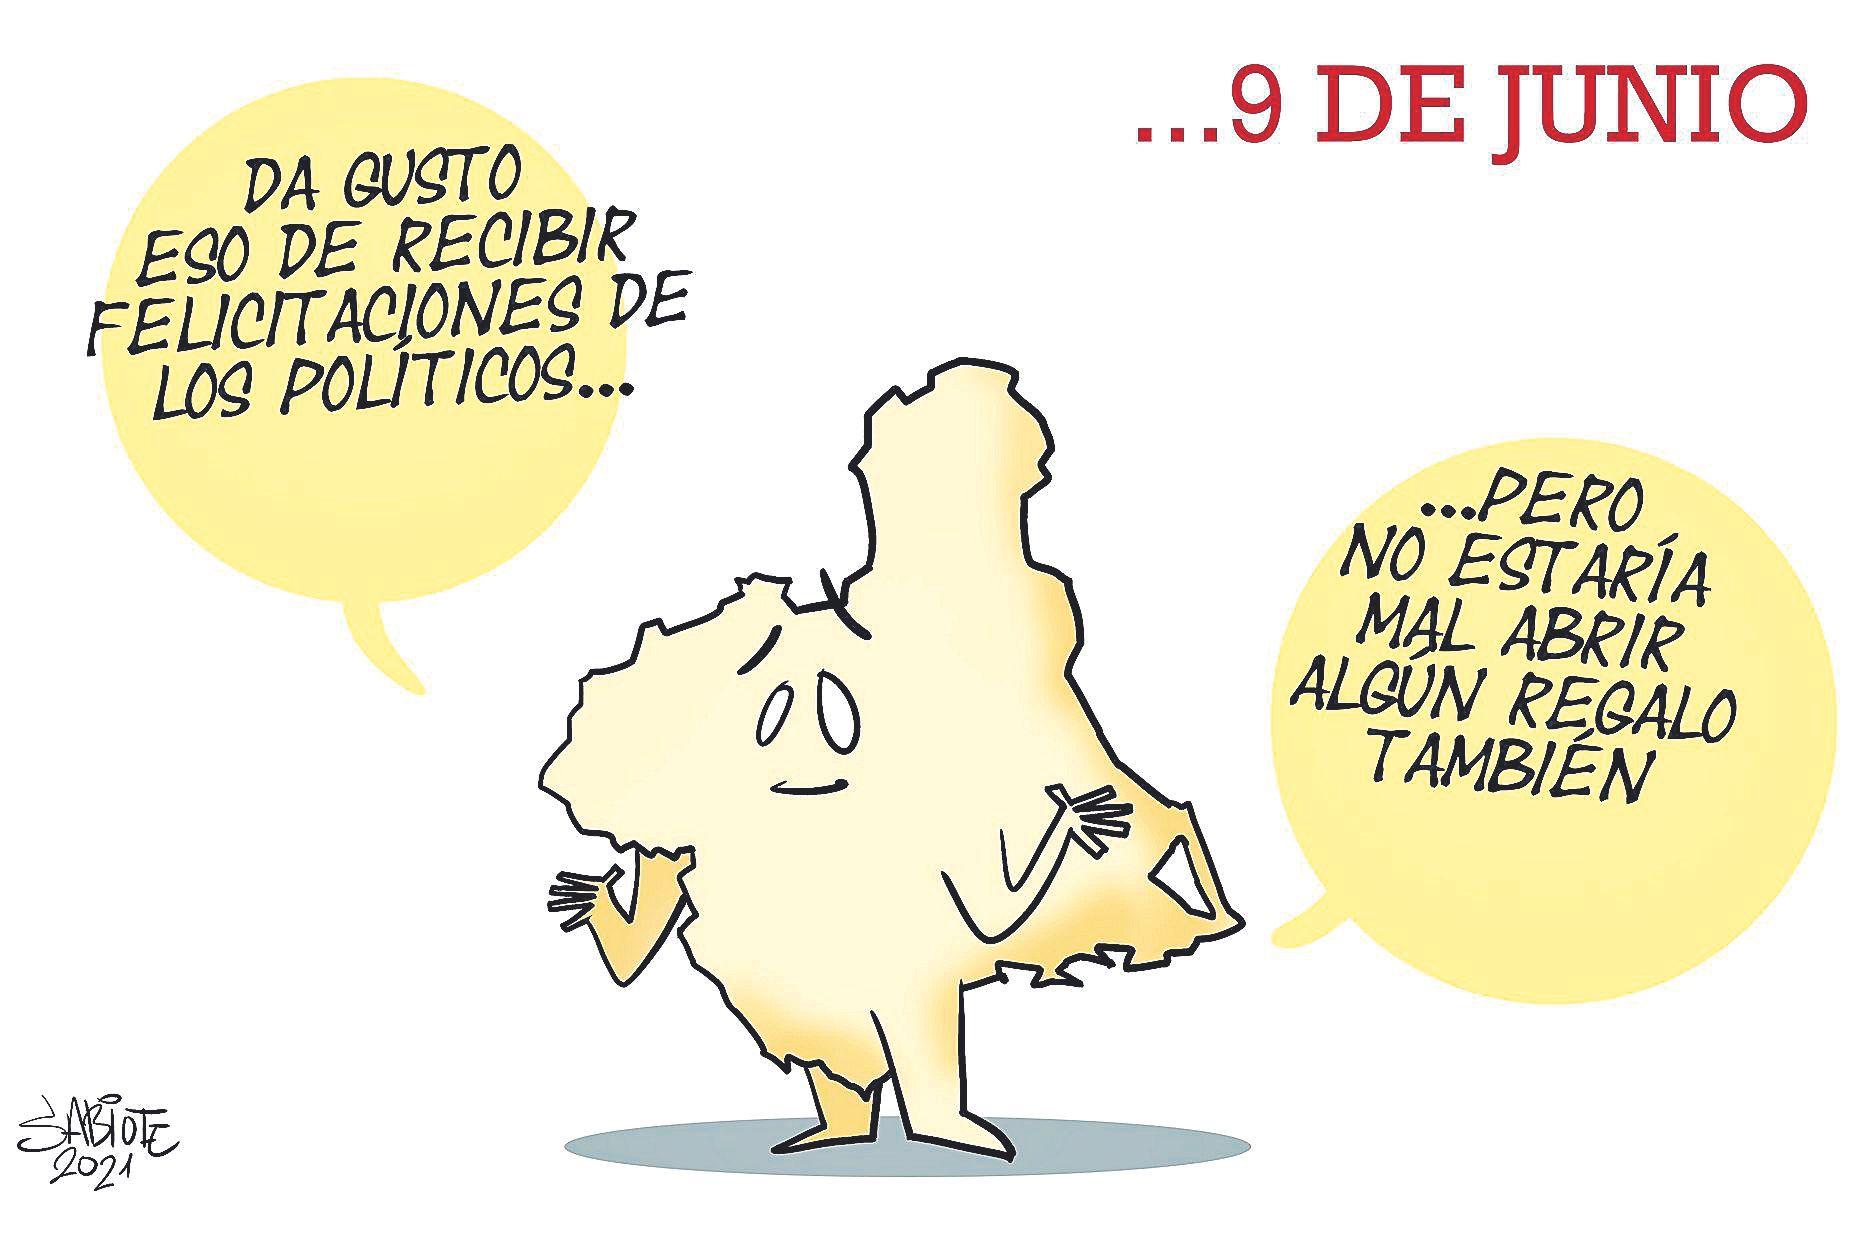 La Rendija de Sabiote (09/06/2021)